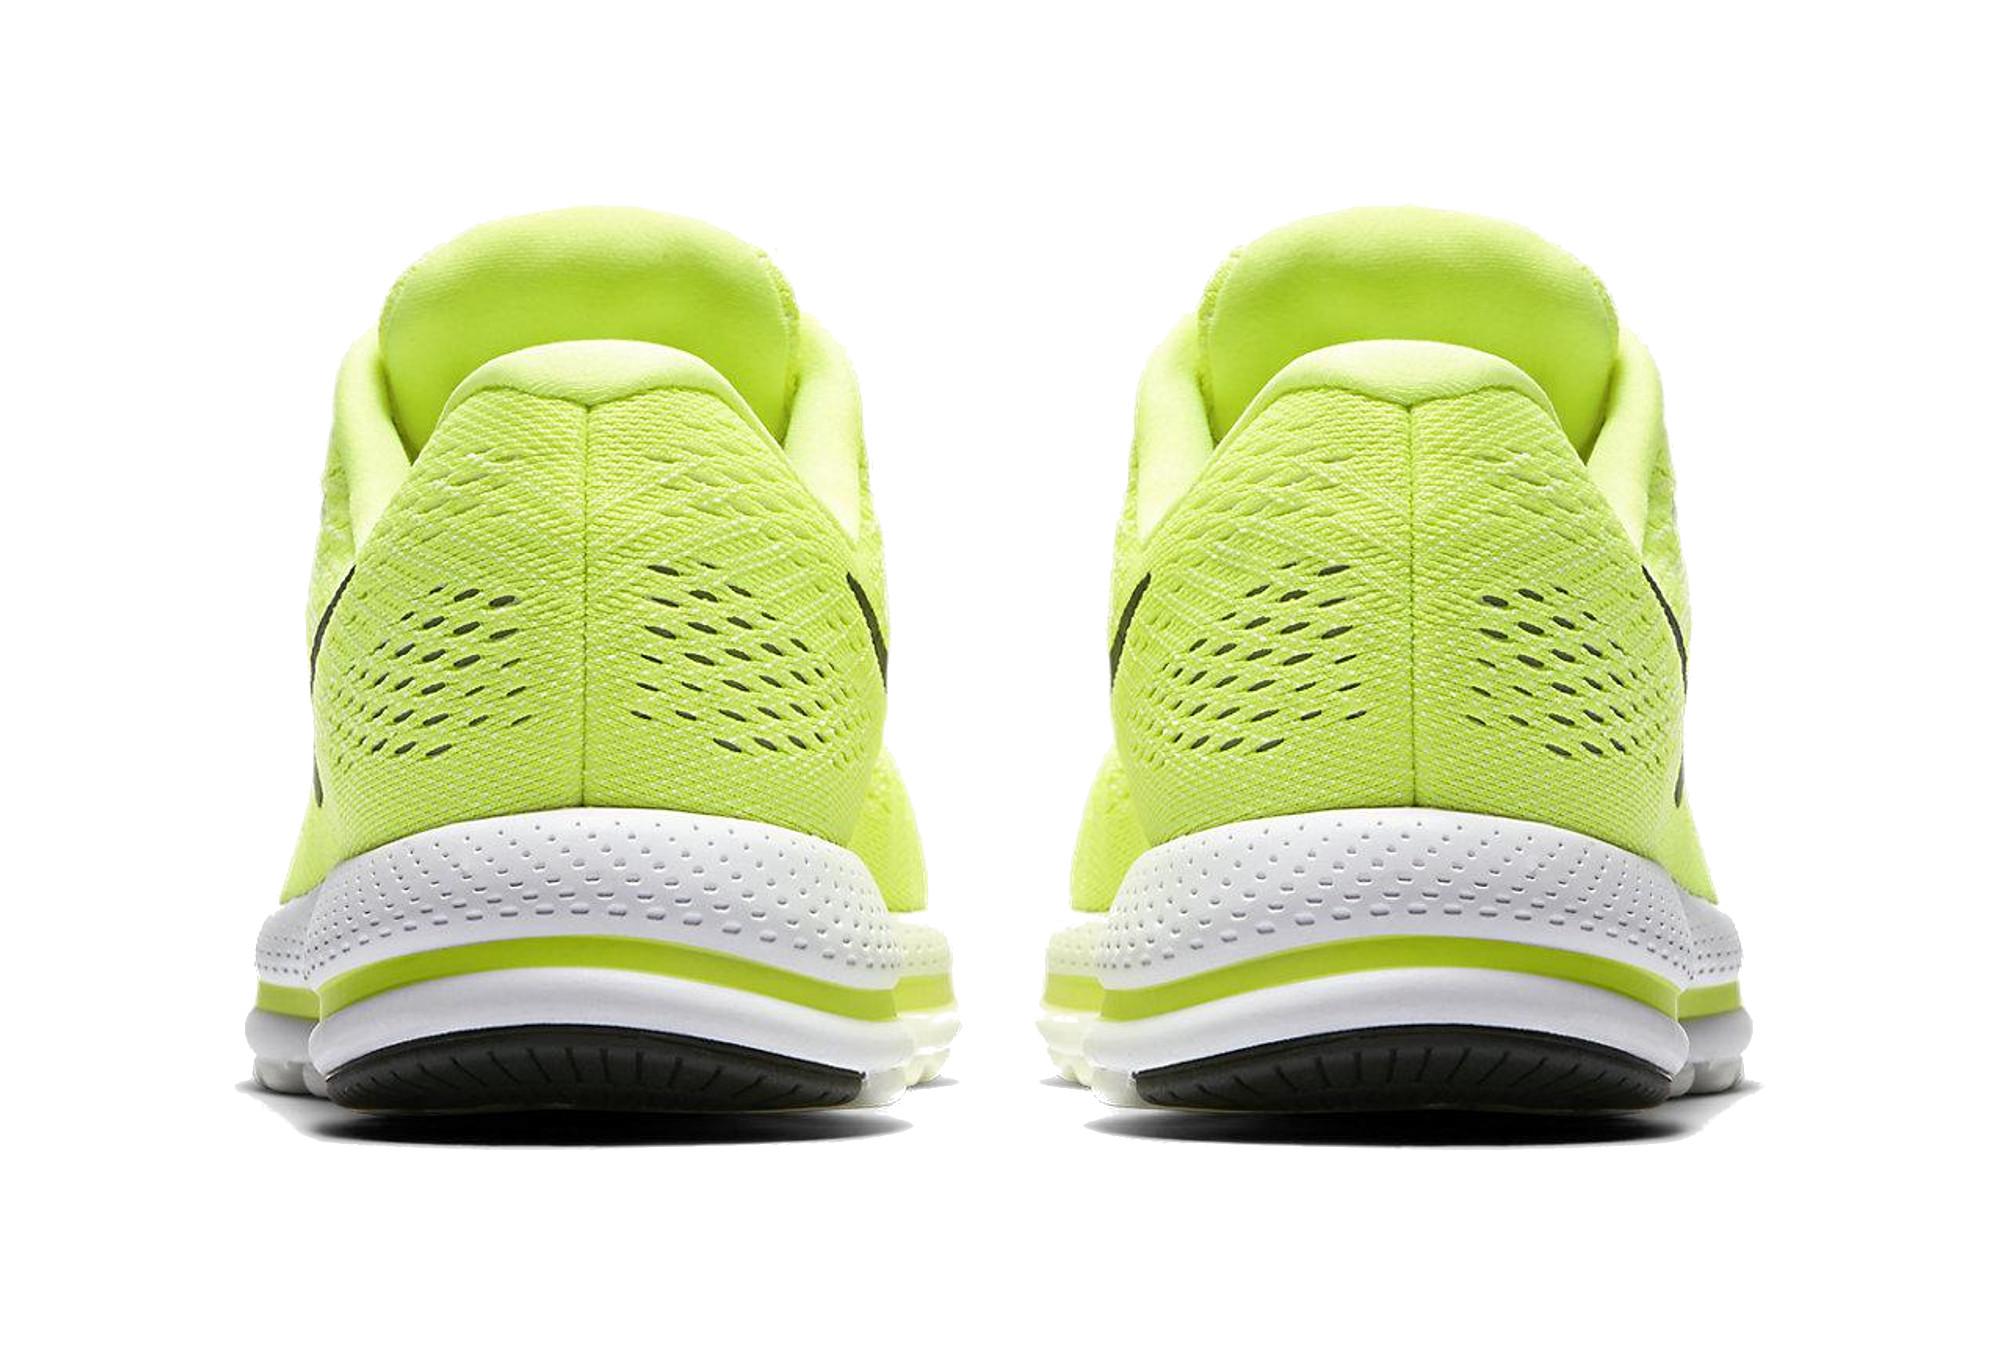 best website c4fd0 fda11 Chaussures de Running Nike AIR ZOOM VOMERO 12 Jaune   Blanc